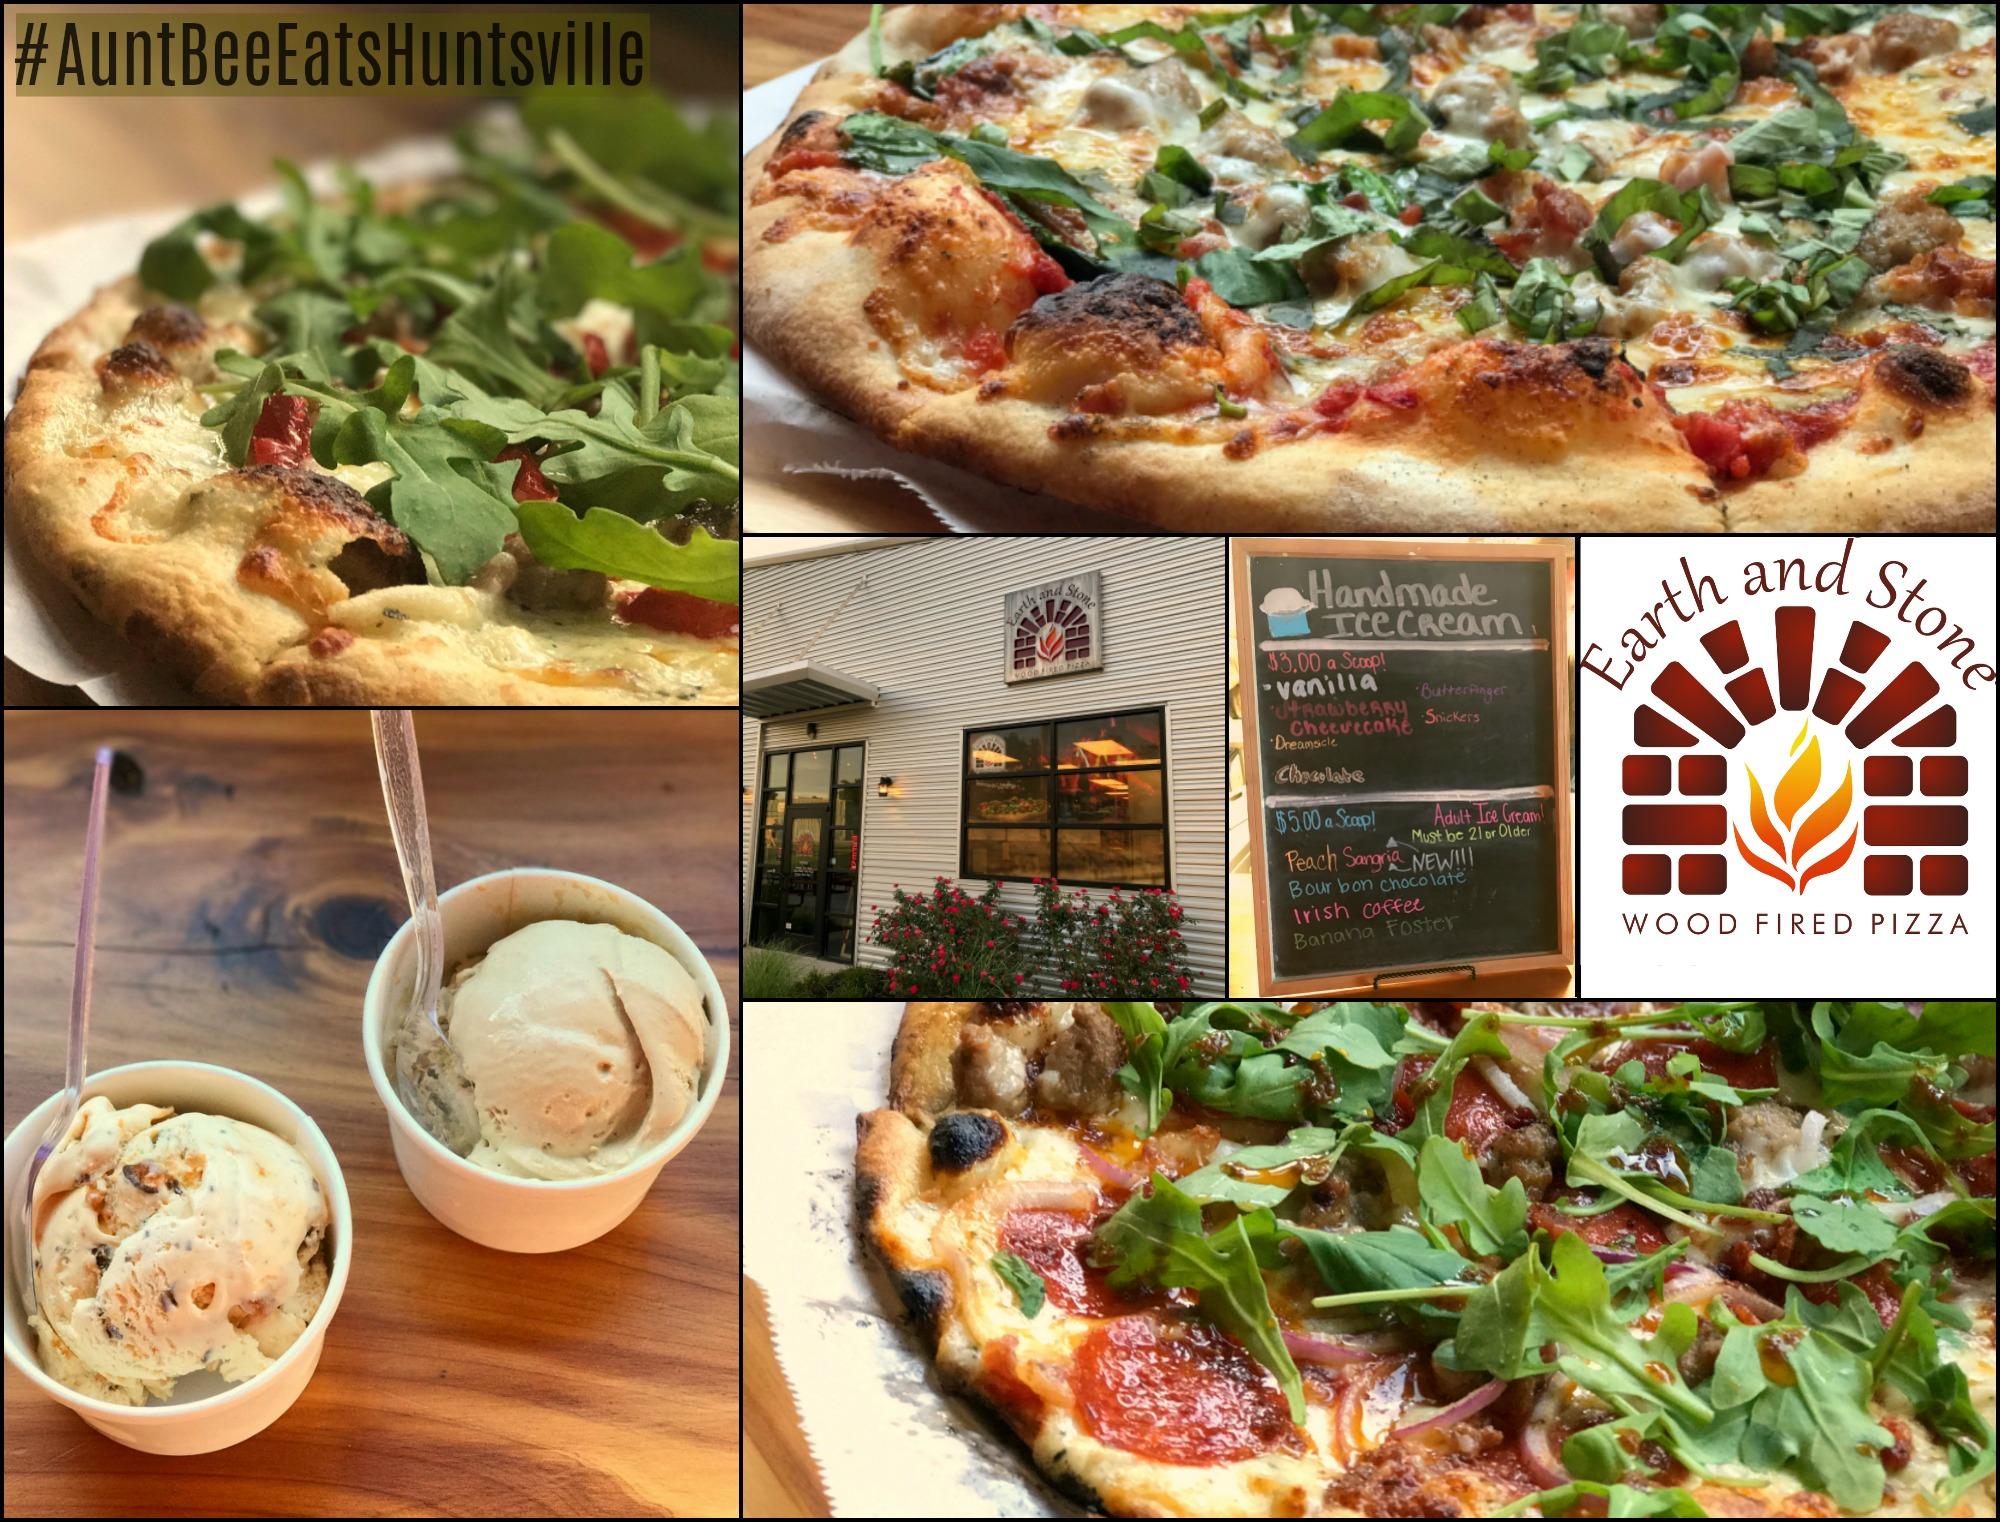 Earth and Stone Wood Fire Pizza #AuntBeeEatsHuntsville